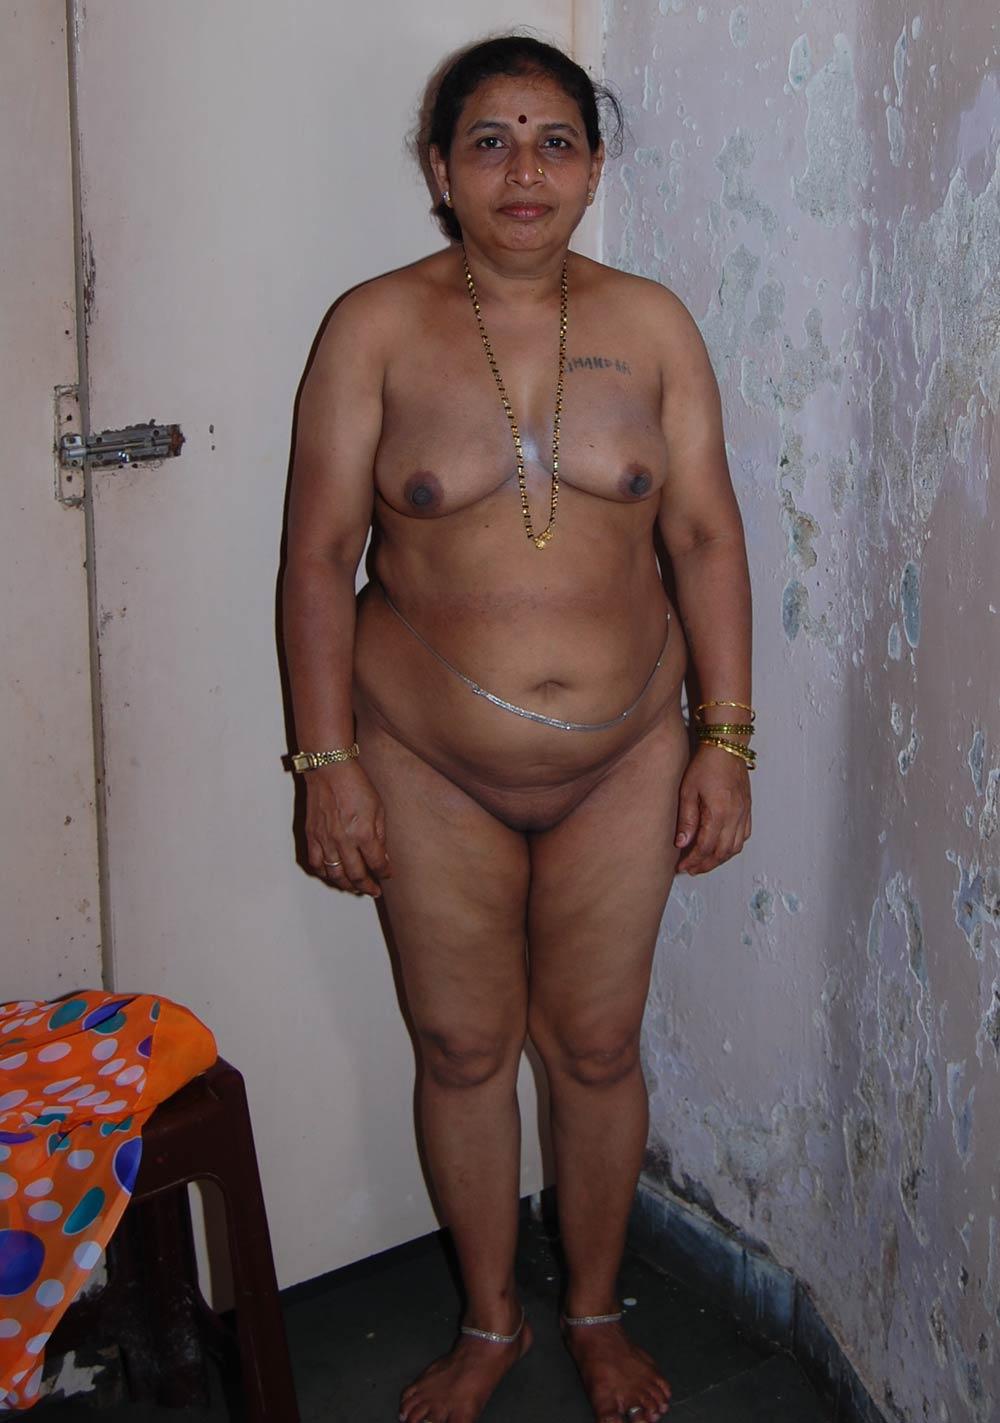 webcam-girls-hot-indian-mom-pussy-nude-girl-interracial-sex